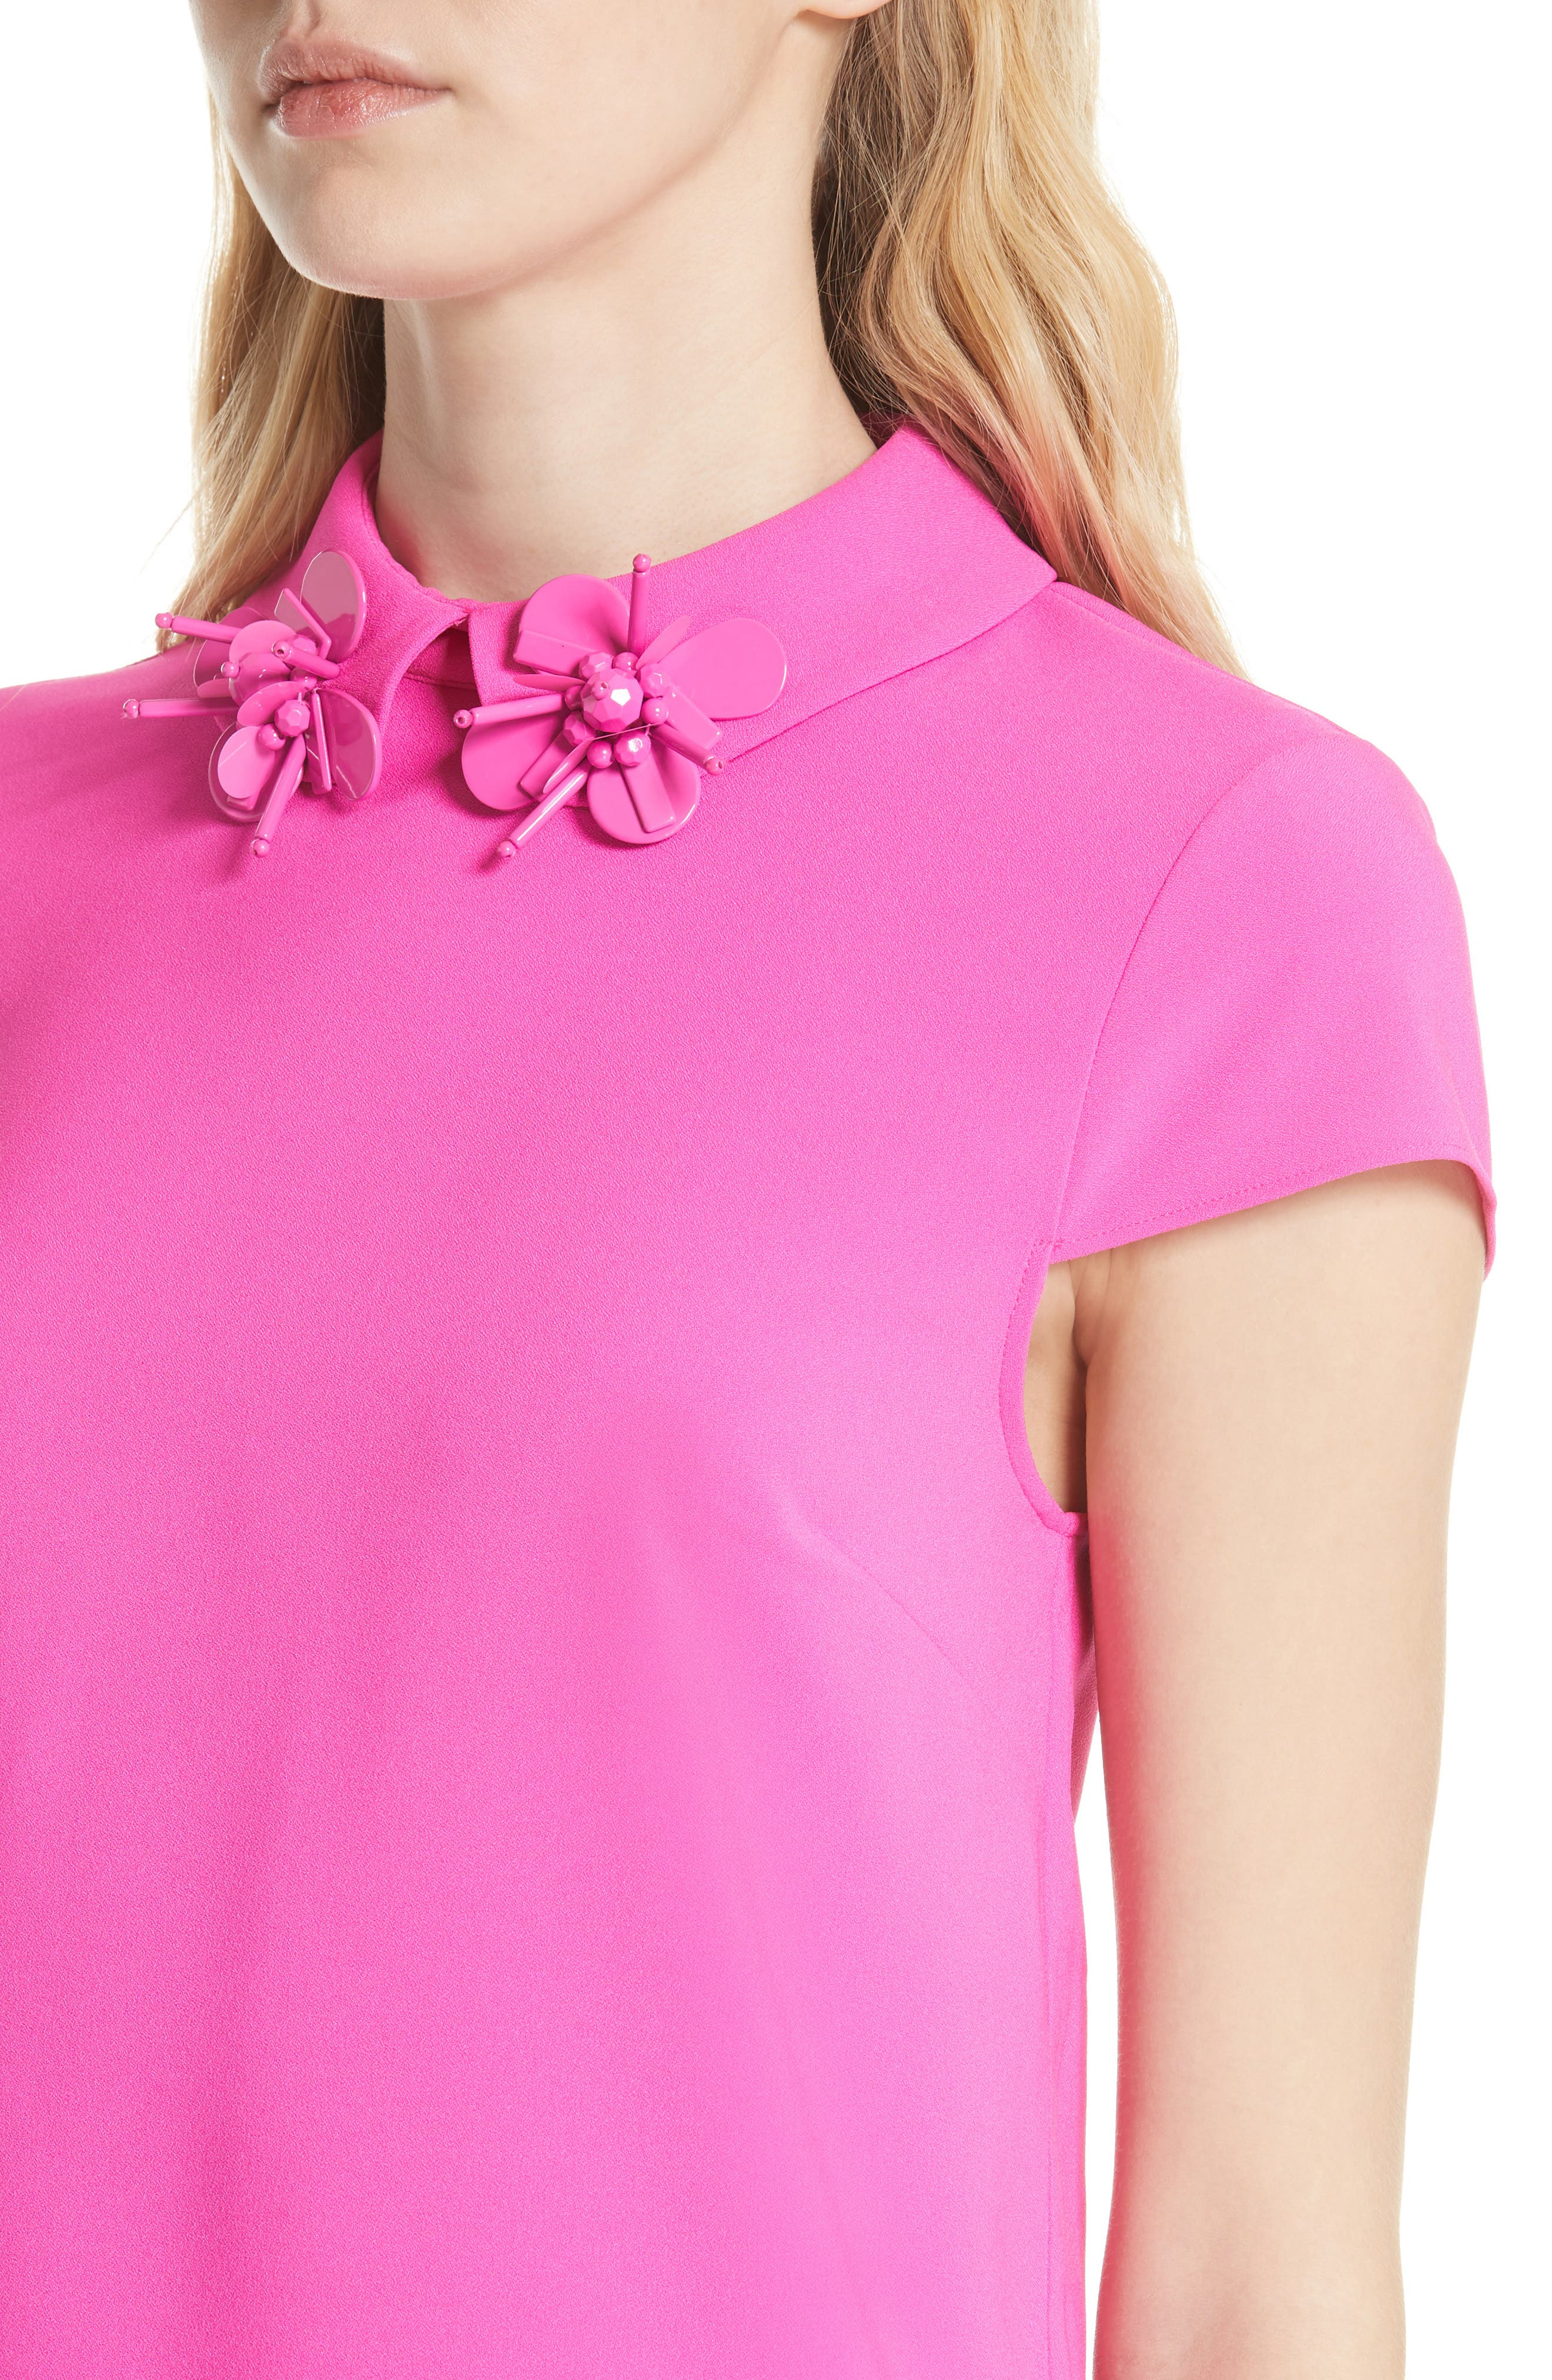 Ammah Embellished Collar Crepe Top,                             Alternate thumbnail 4, color,                             671